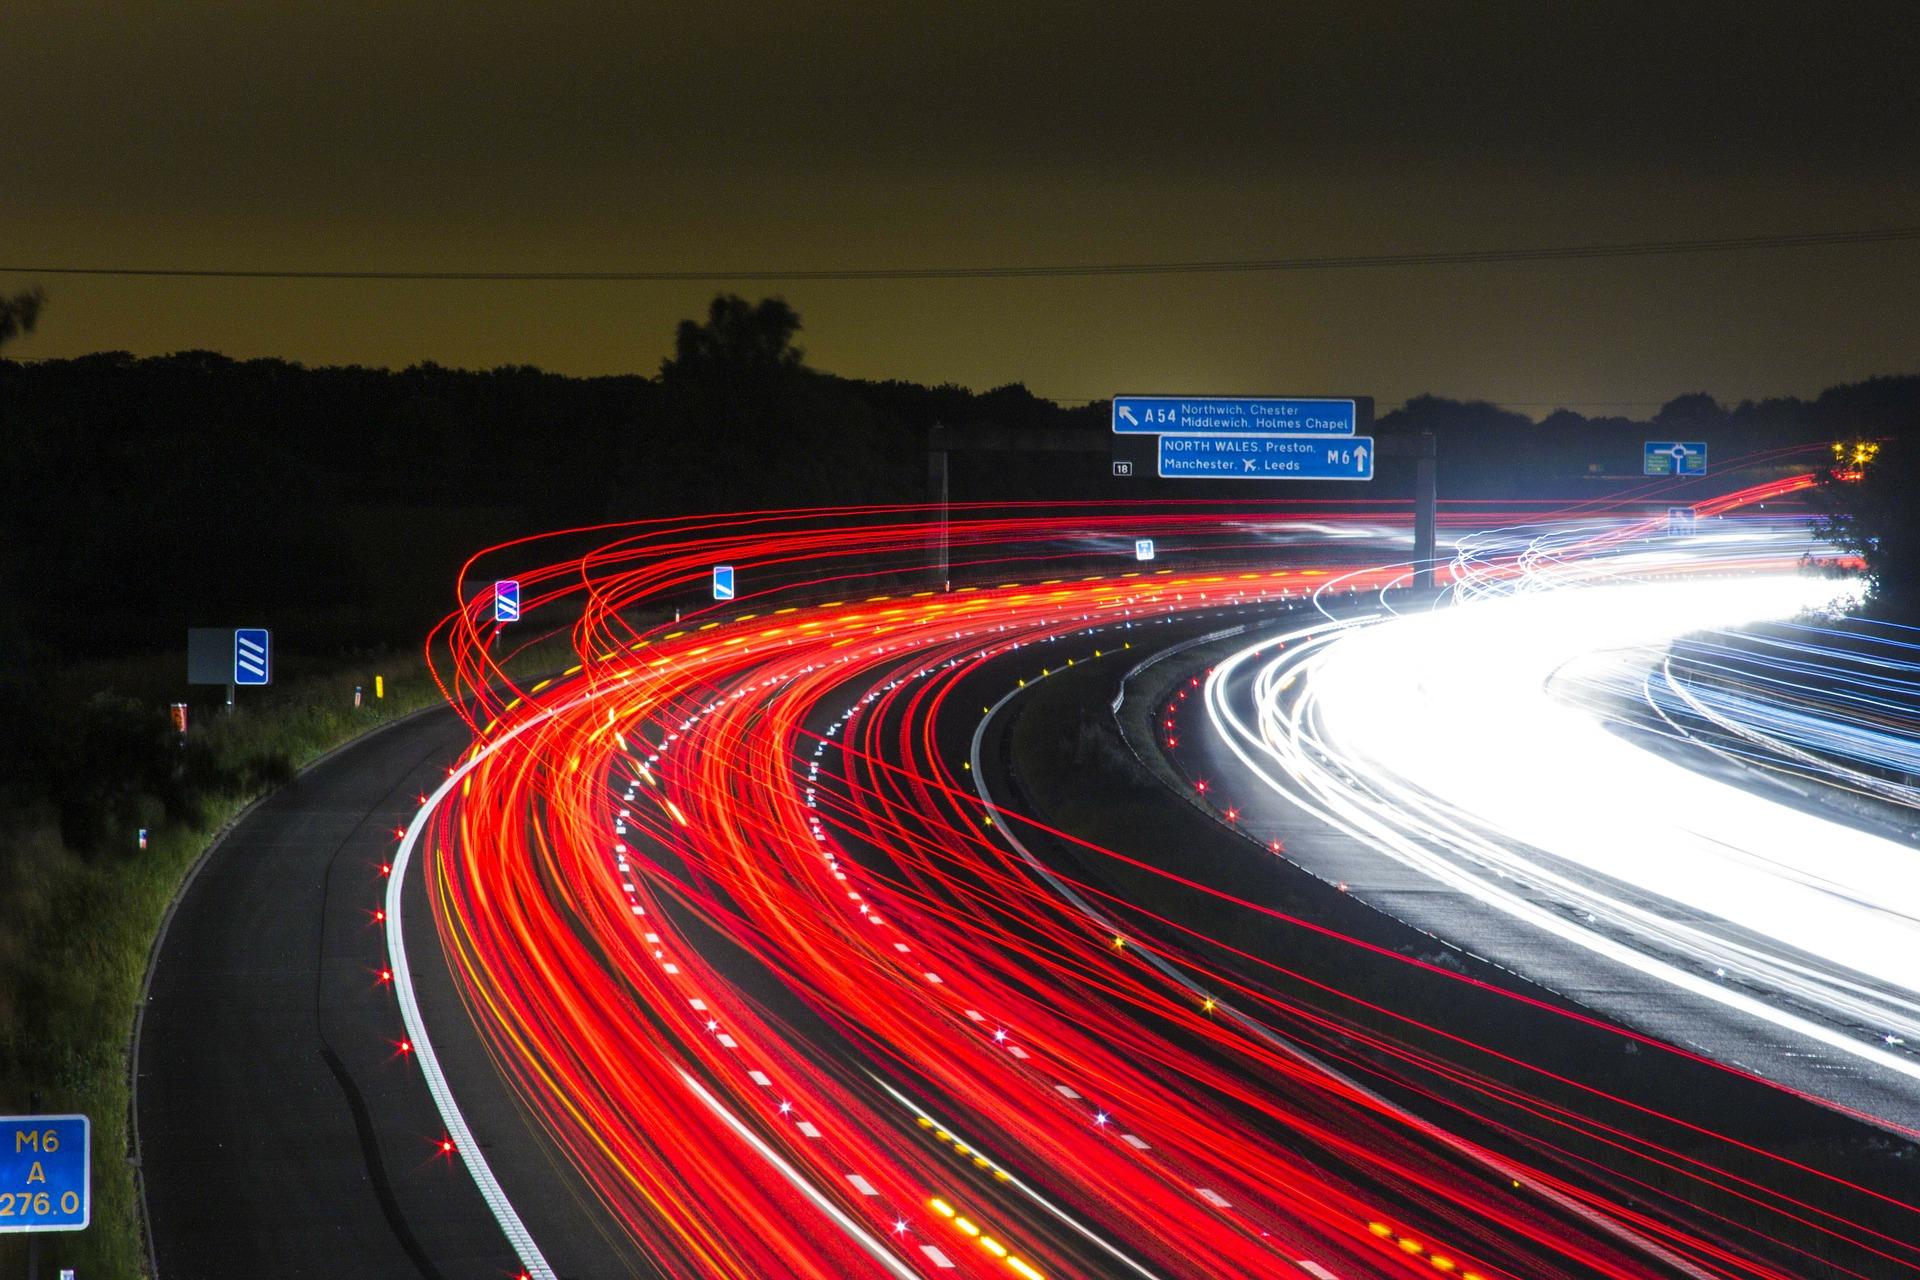 traffic-change-revolution-globalization